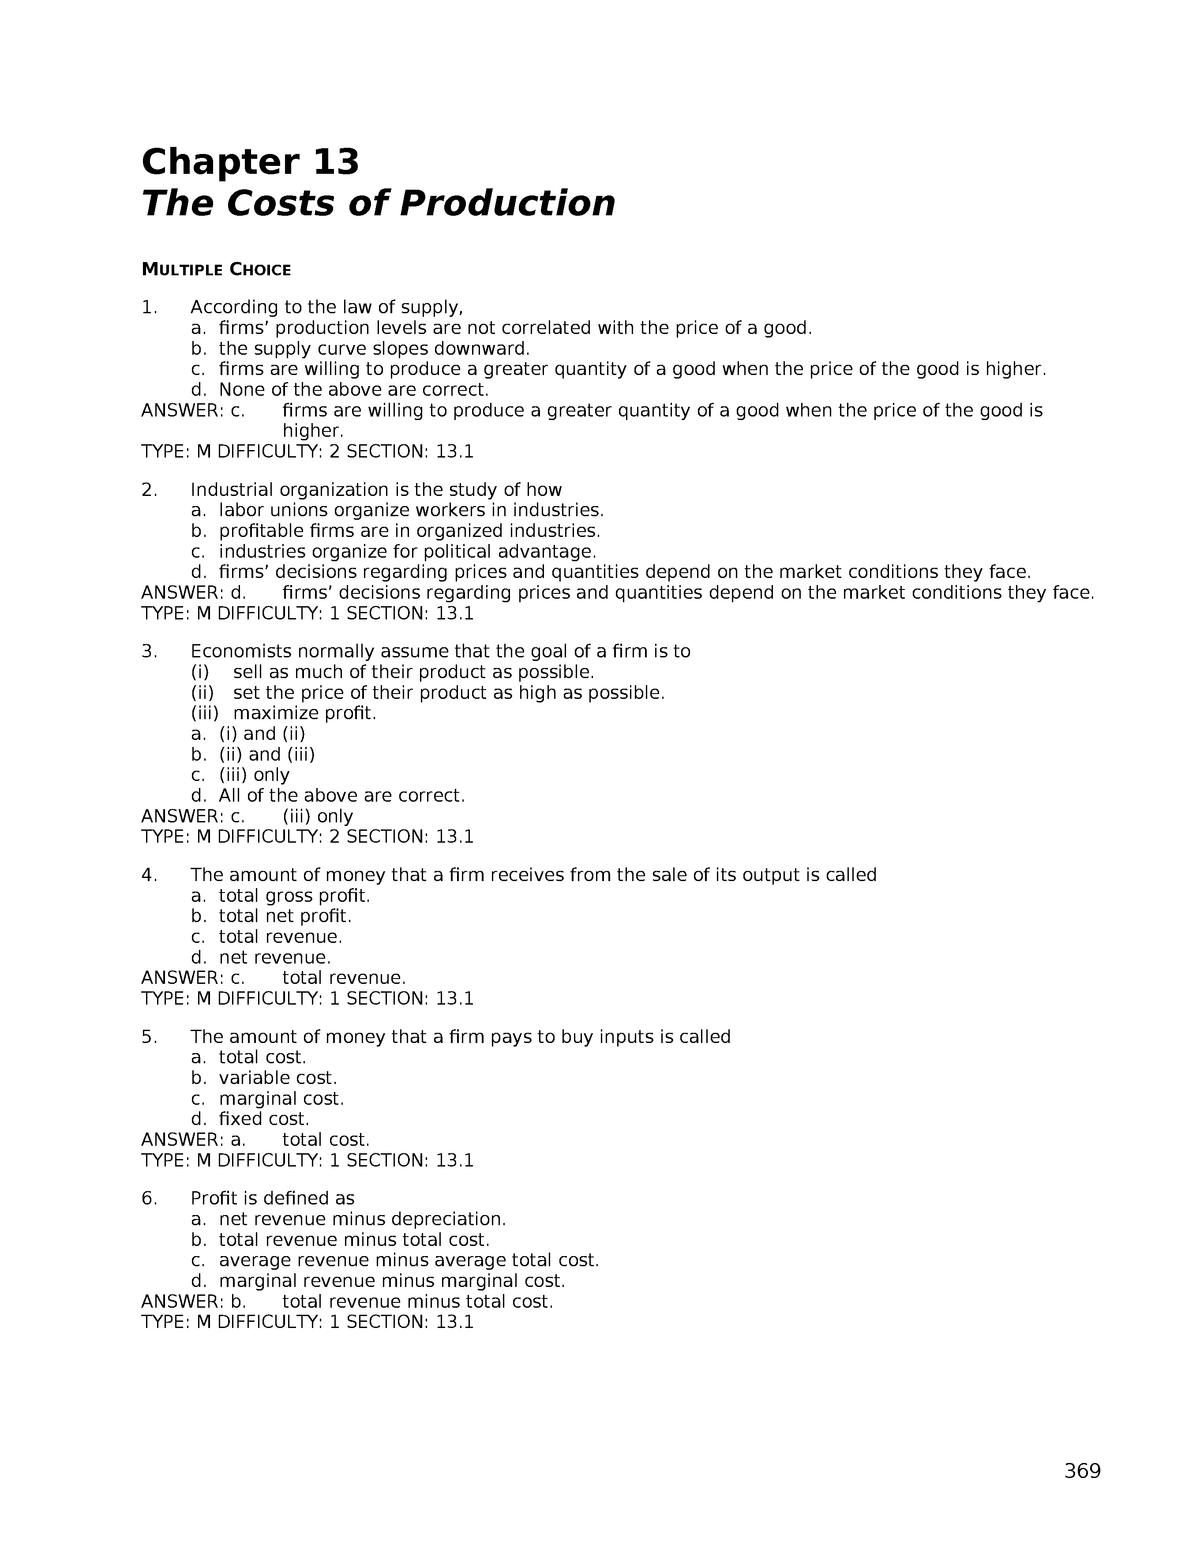 Calcul Salaire Net Québec >> Book Solution Principles Of Microeconomics Hubbard Chapter 13